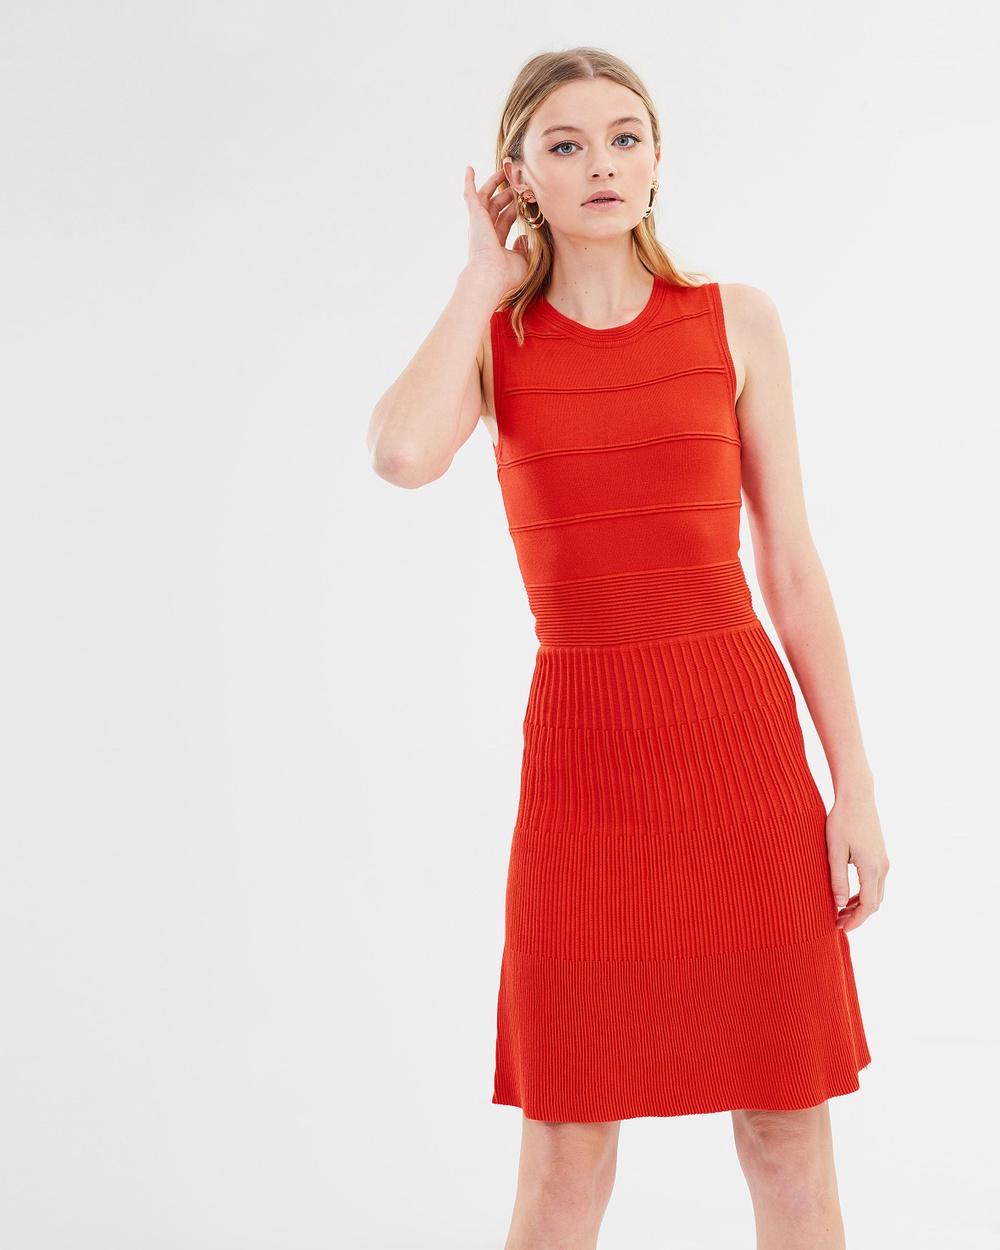 Warehouse Stitch Flippy Dress Dresses Bright Red Stitch Flippy Dress